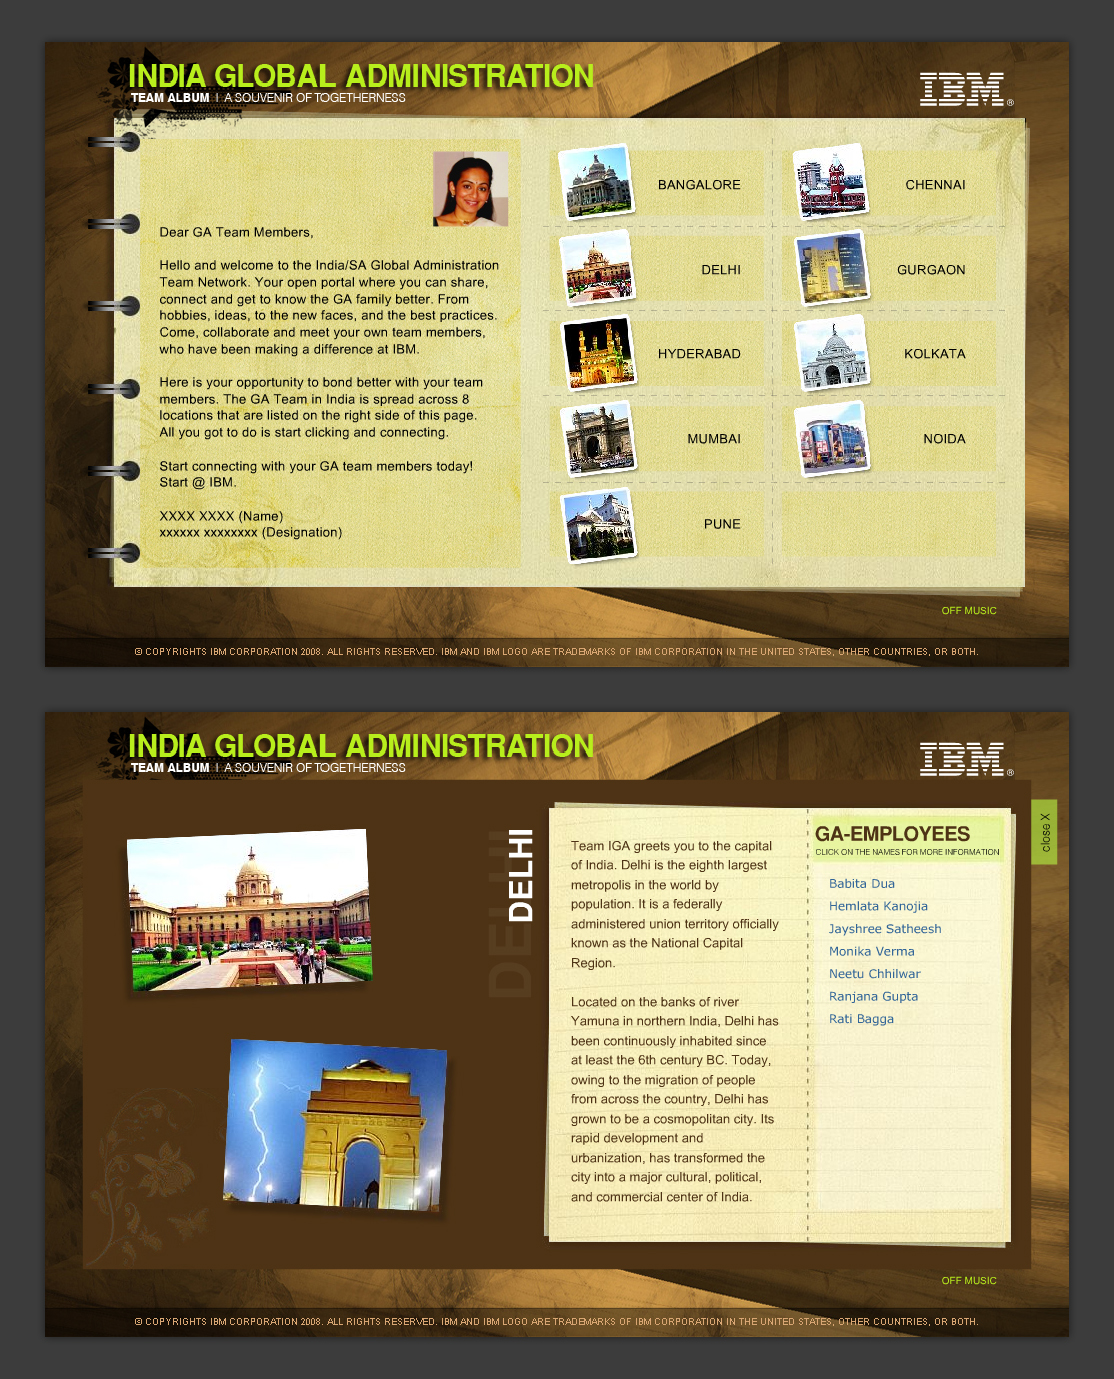 IGA Presenatation Screen Shot by pulsetemple